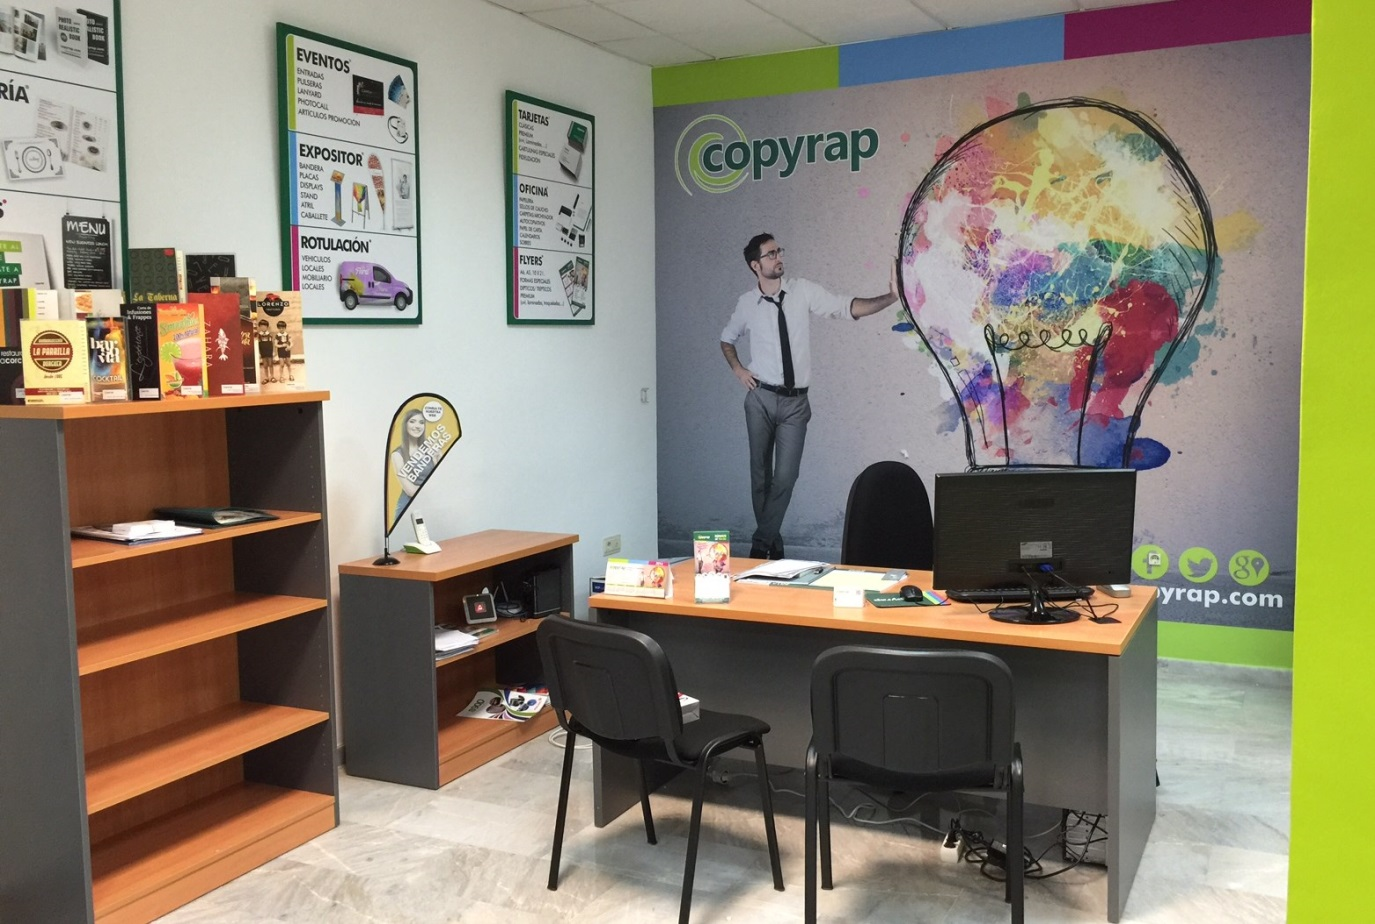 copyrp